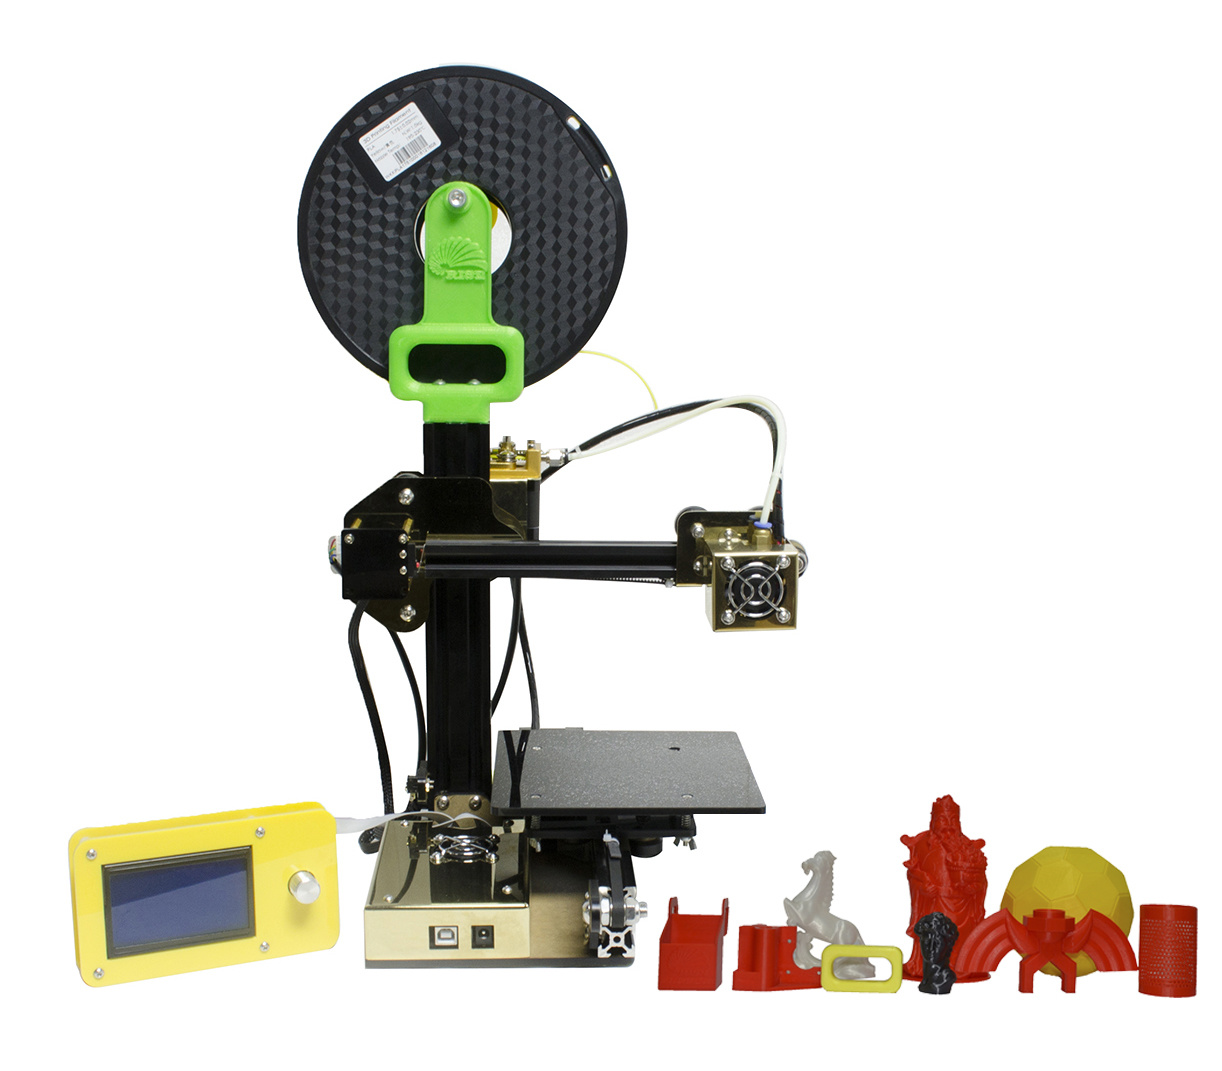 High Performance Rapid Prototype Fdm Digital DIY 3D Printer Machine